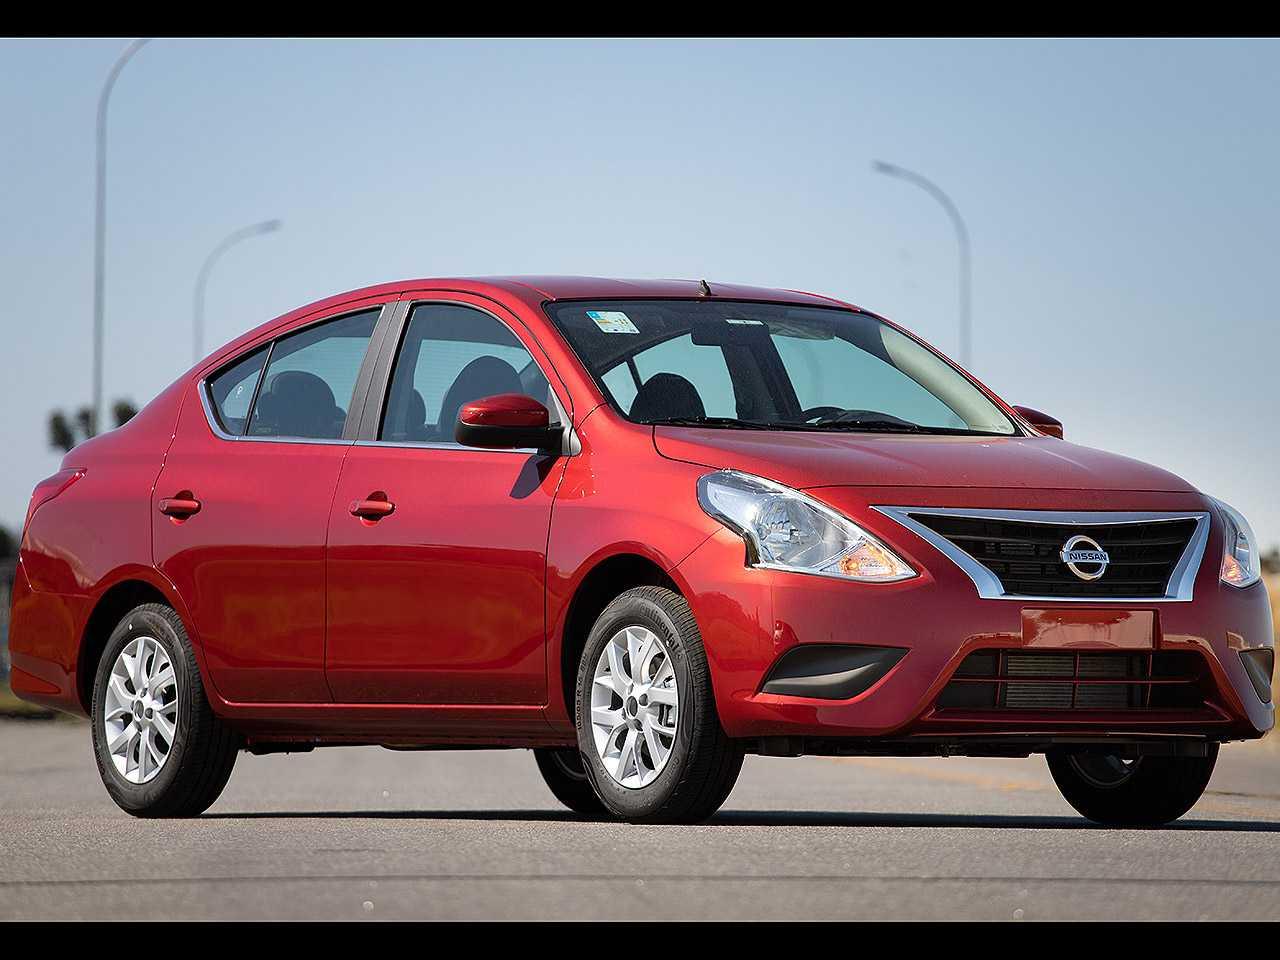 Nissan V-Drive 1.6